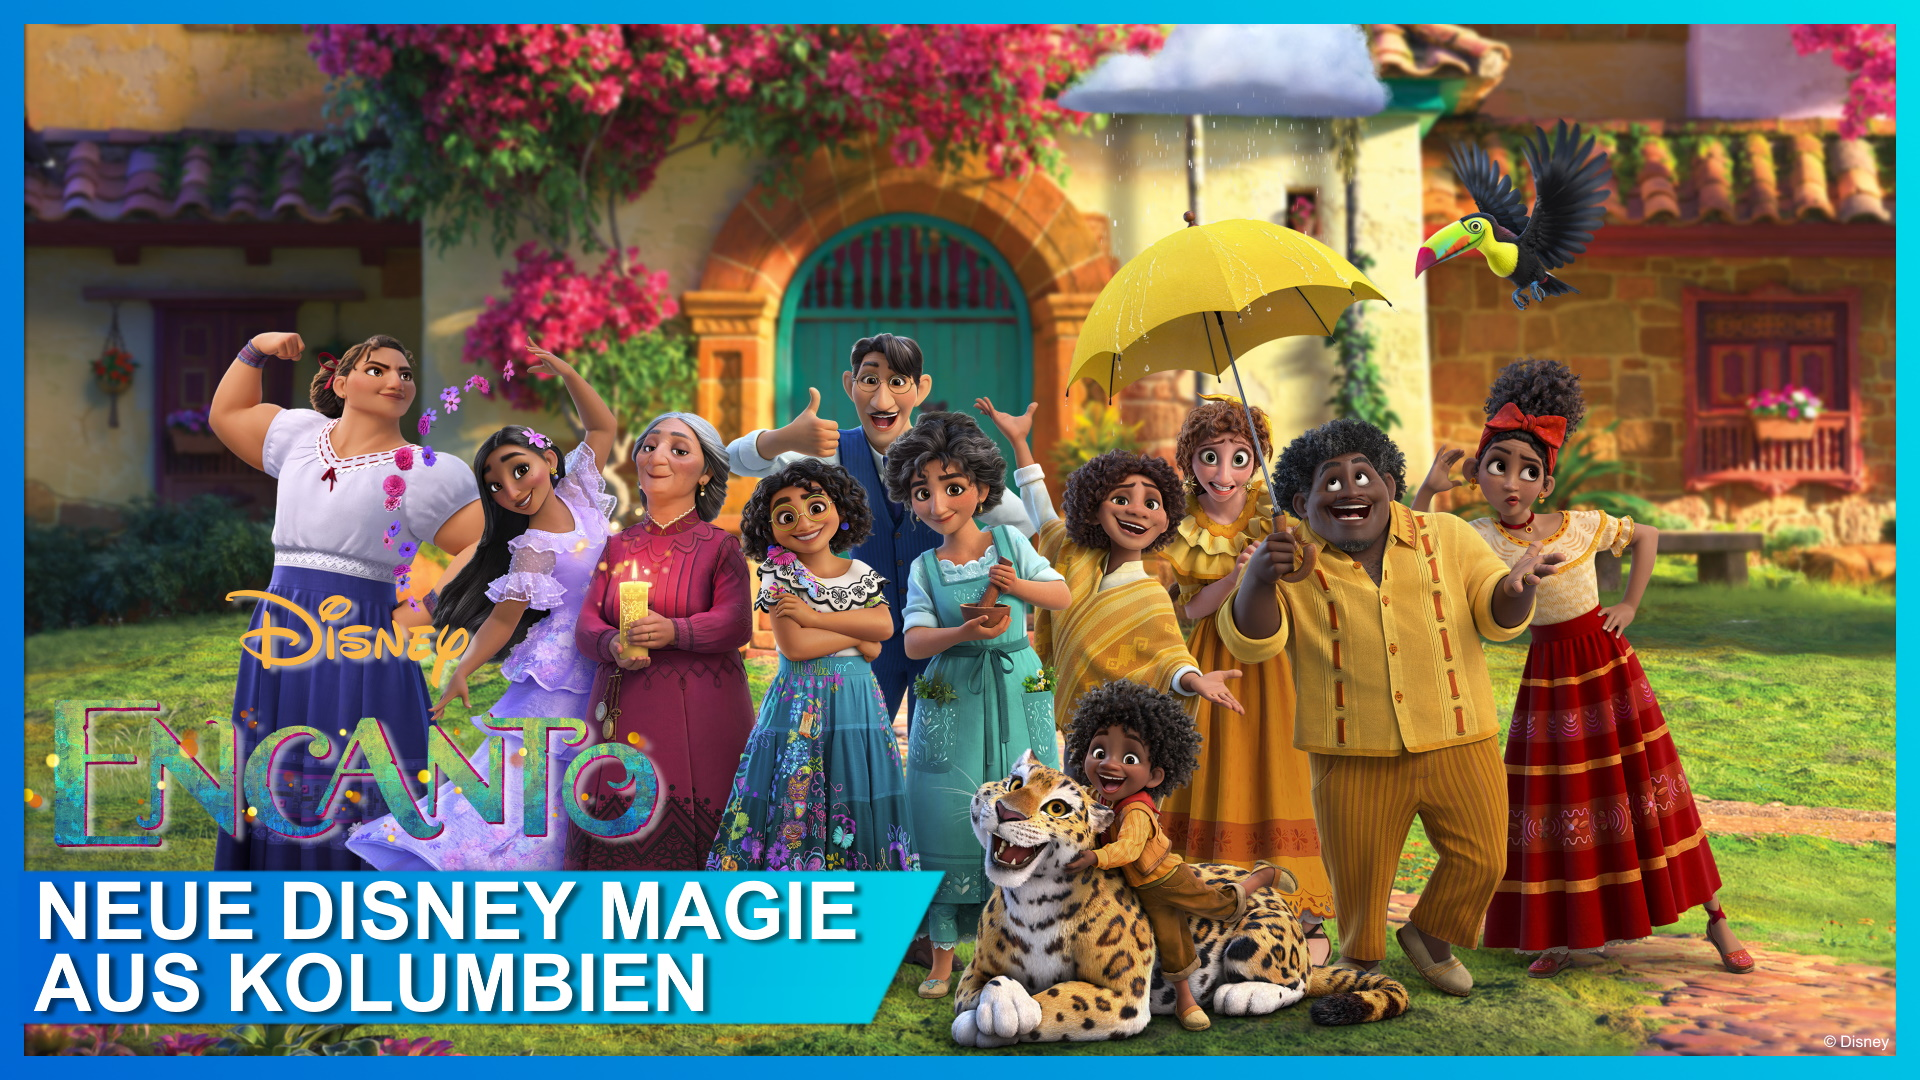 Disney Animation Studios' Encanto